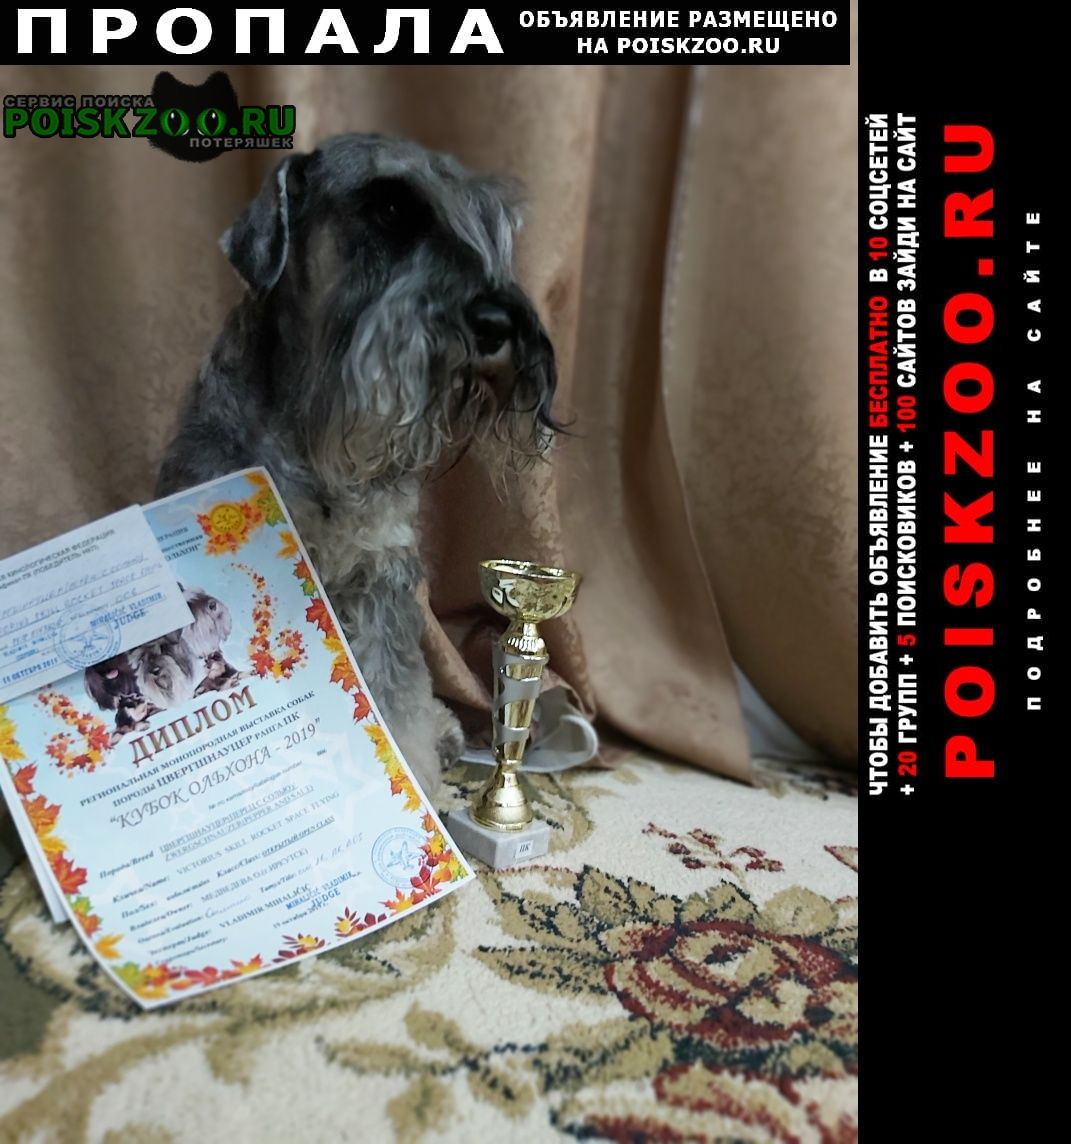 Пропала собака цвергшнауцер Иркутск